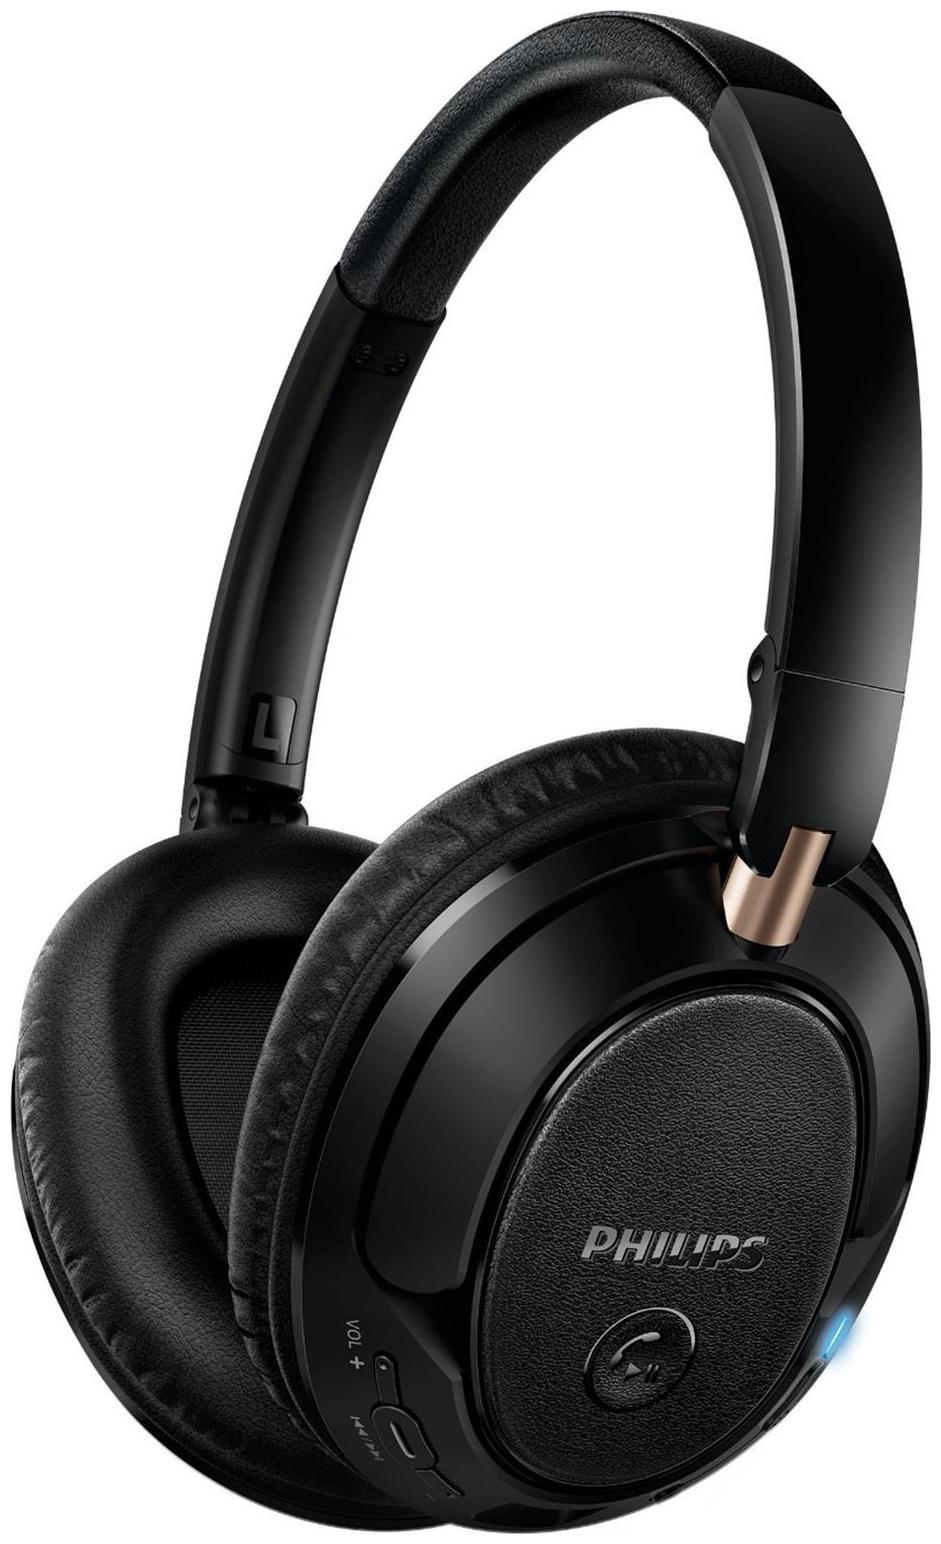 Philips SHB7250/00 Wireless Bluetooth Headphones  Black